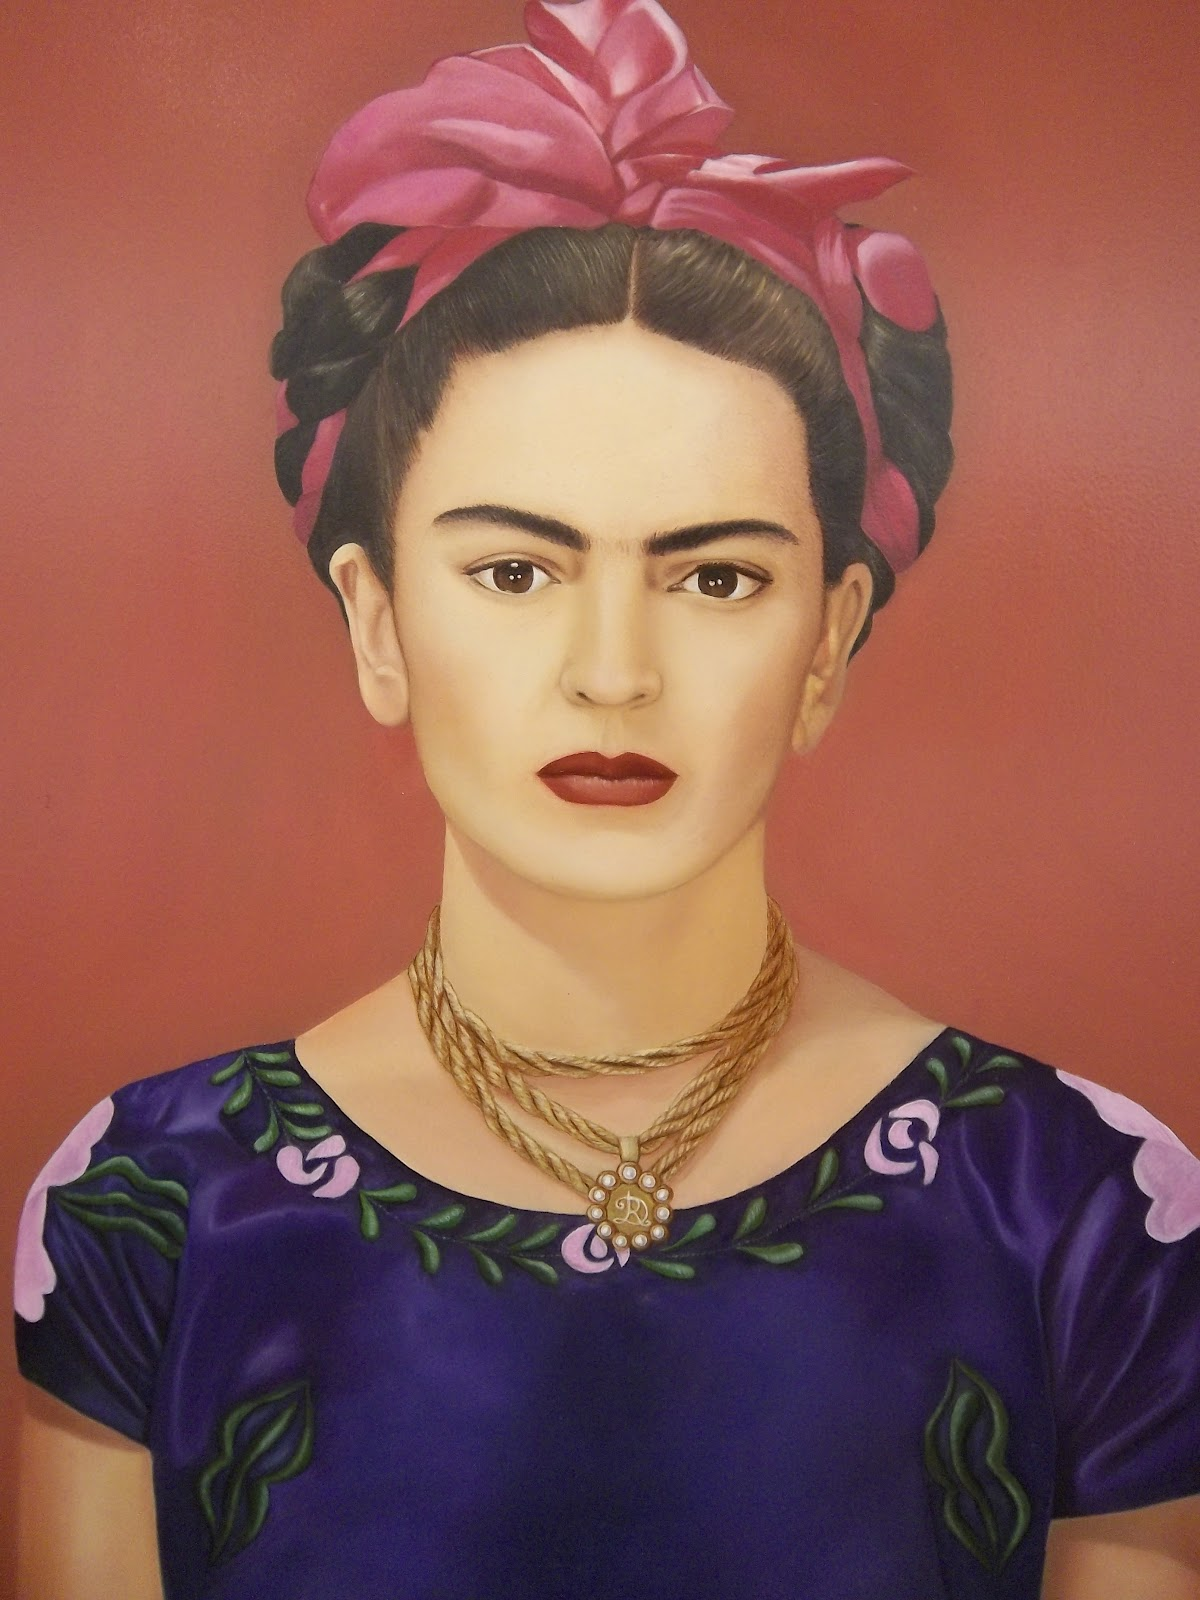 http://2.bp.blogspot.com/-yKzQzyWkEK8/T4yP-uWG_-I/AAAAAAAADIs/lK1ASO9pNdI/s1600/Ventura.+Retrato+de+Frida+Kahlo.JPG